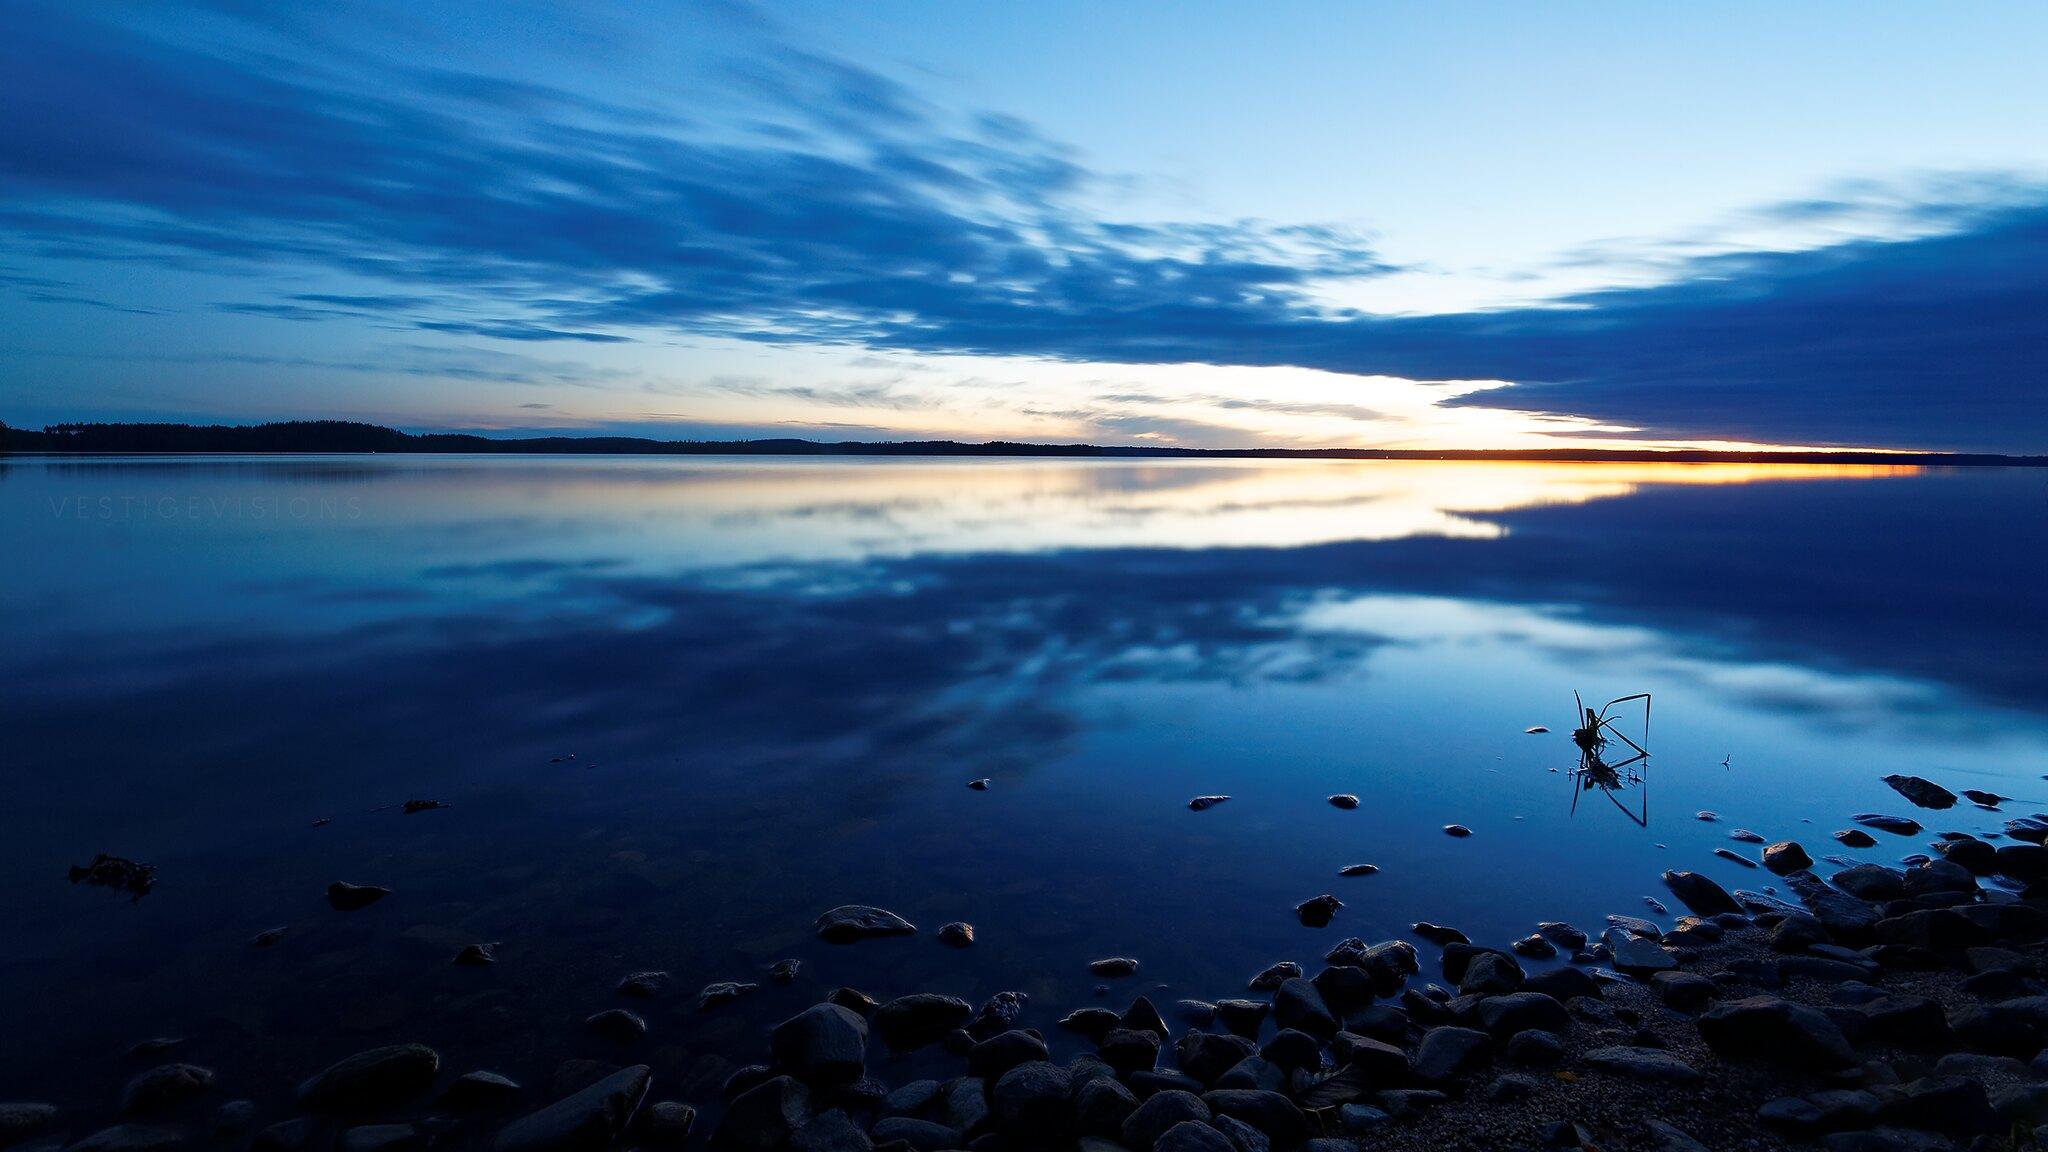 landscape sunset blue hour